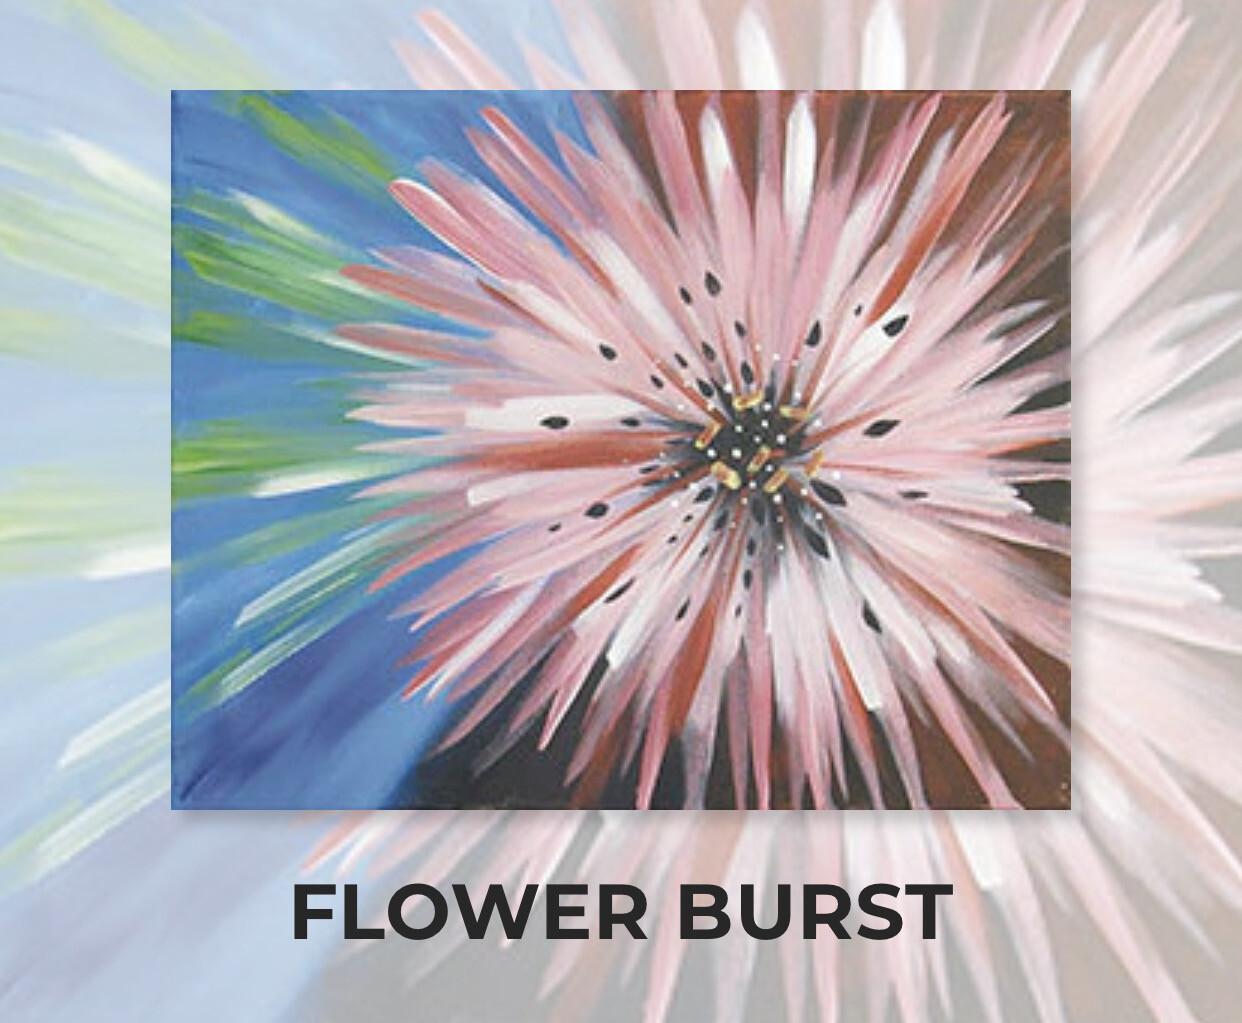 Flower Burst ADULT Acrylic Paint On Canvas DIY Art Kit - 3 Week Special Order